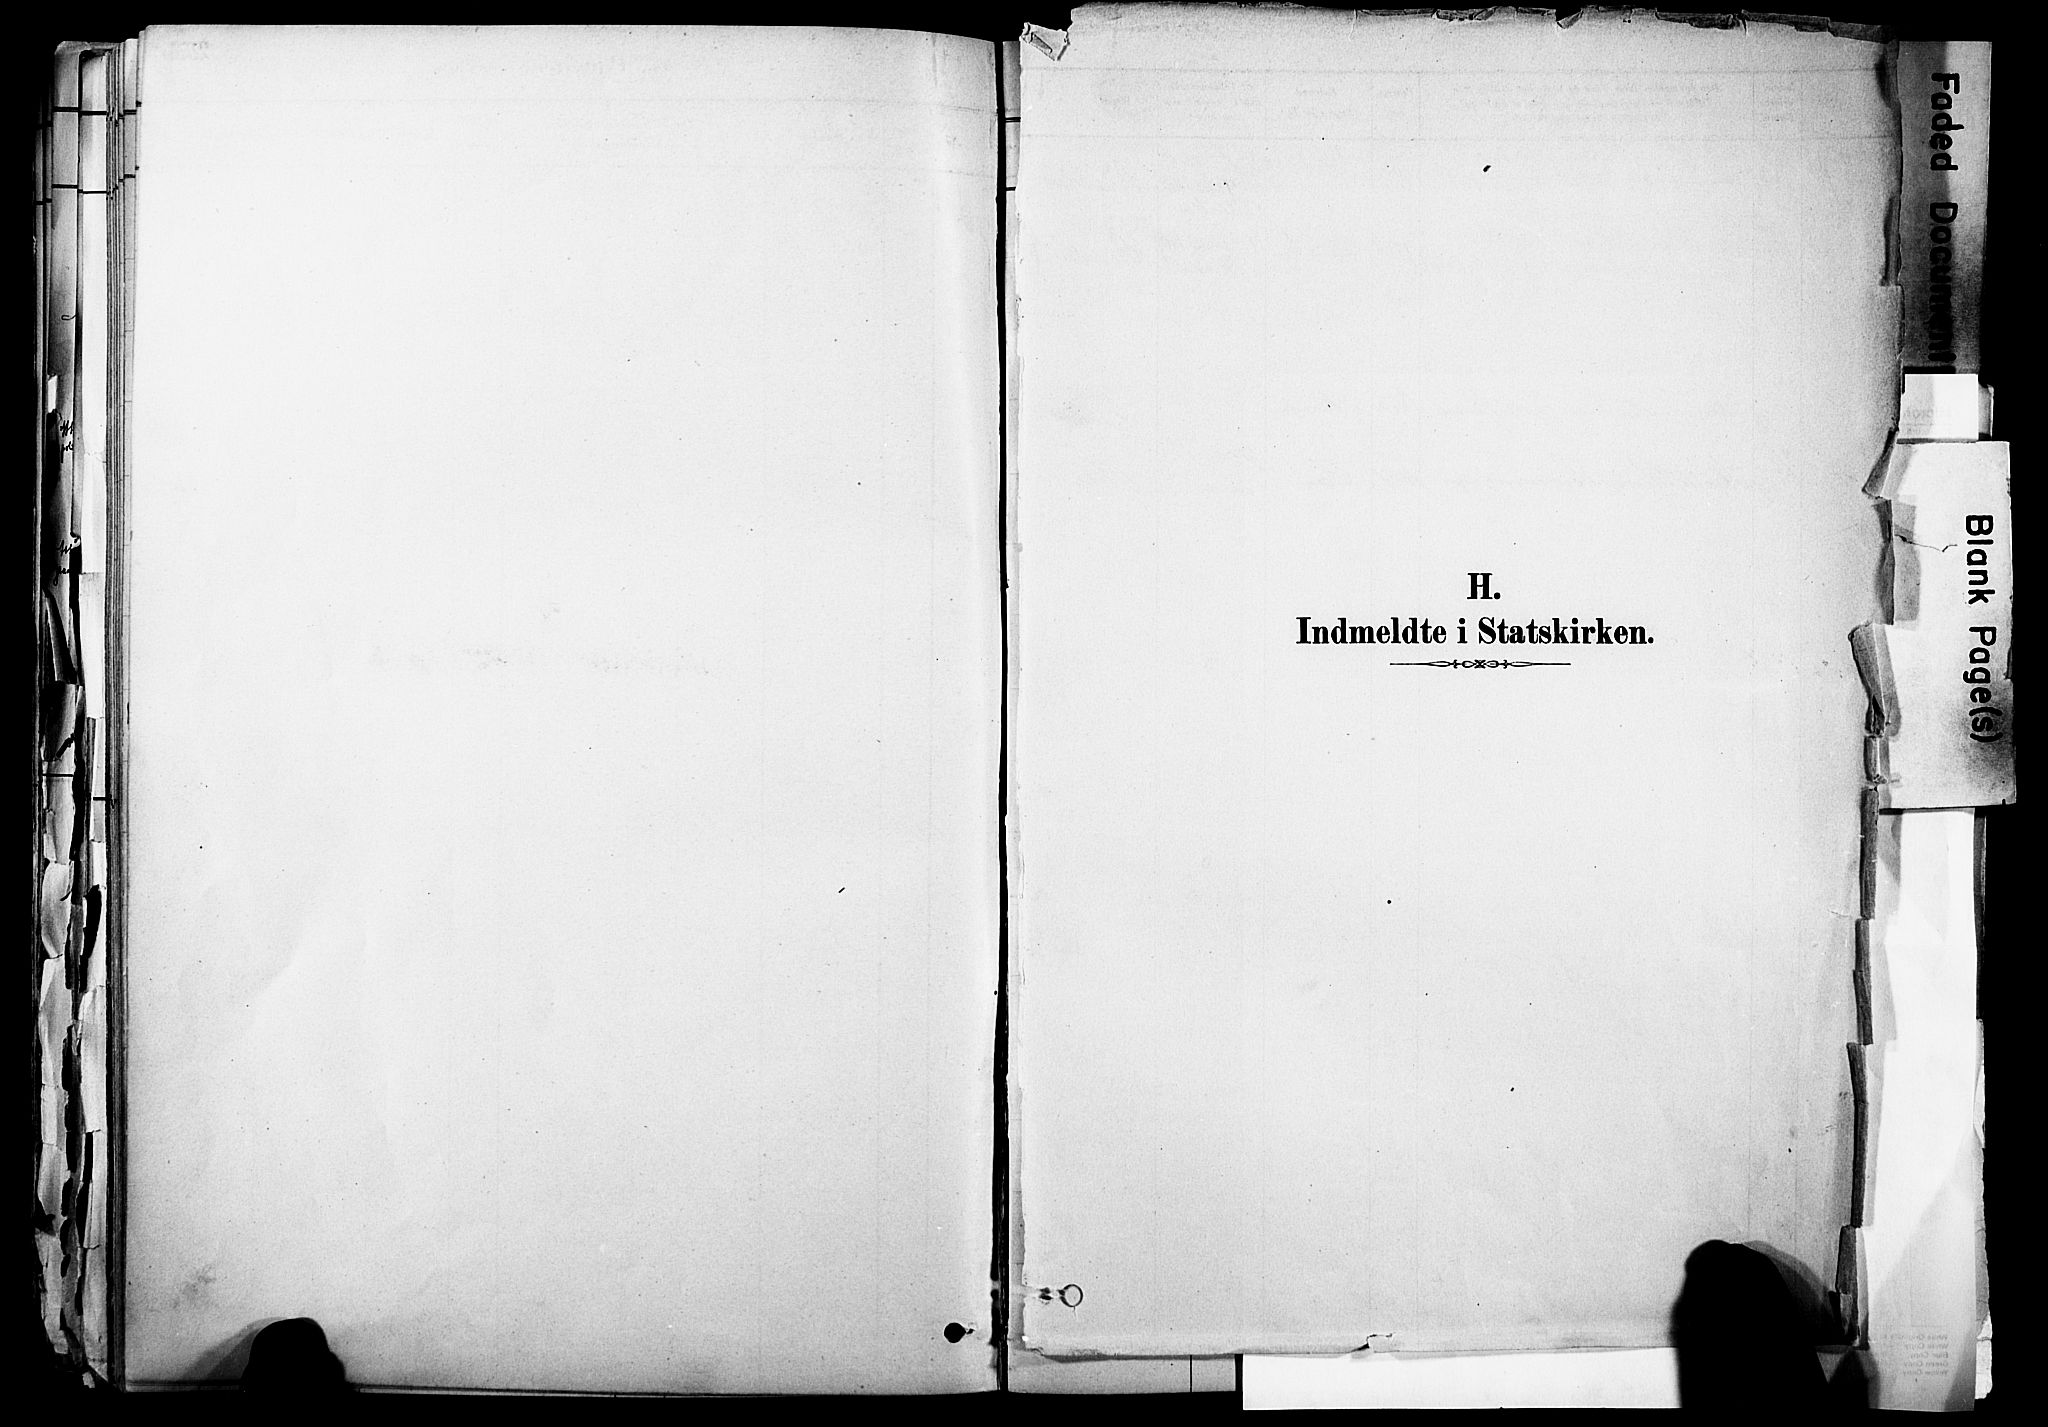 SAH, Skjåk prestekontor, Ministerialbok nr. 3, 1880-1907, s. 276